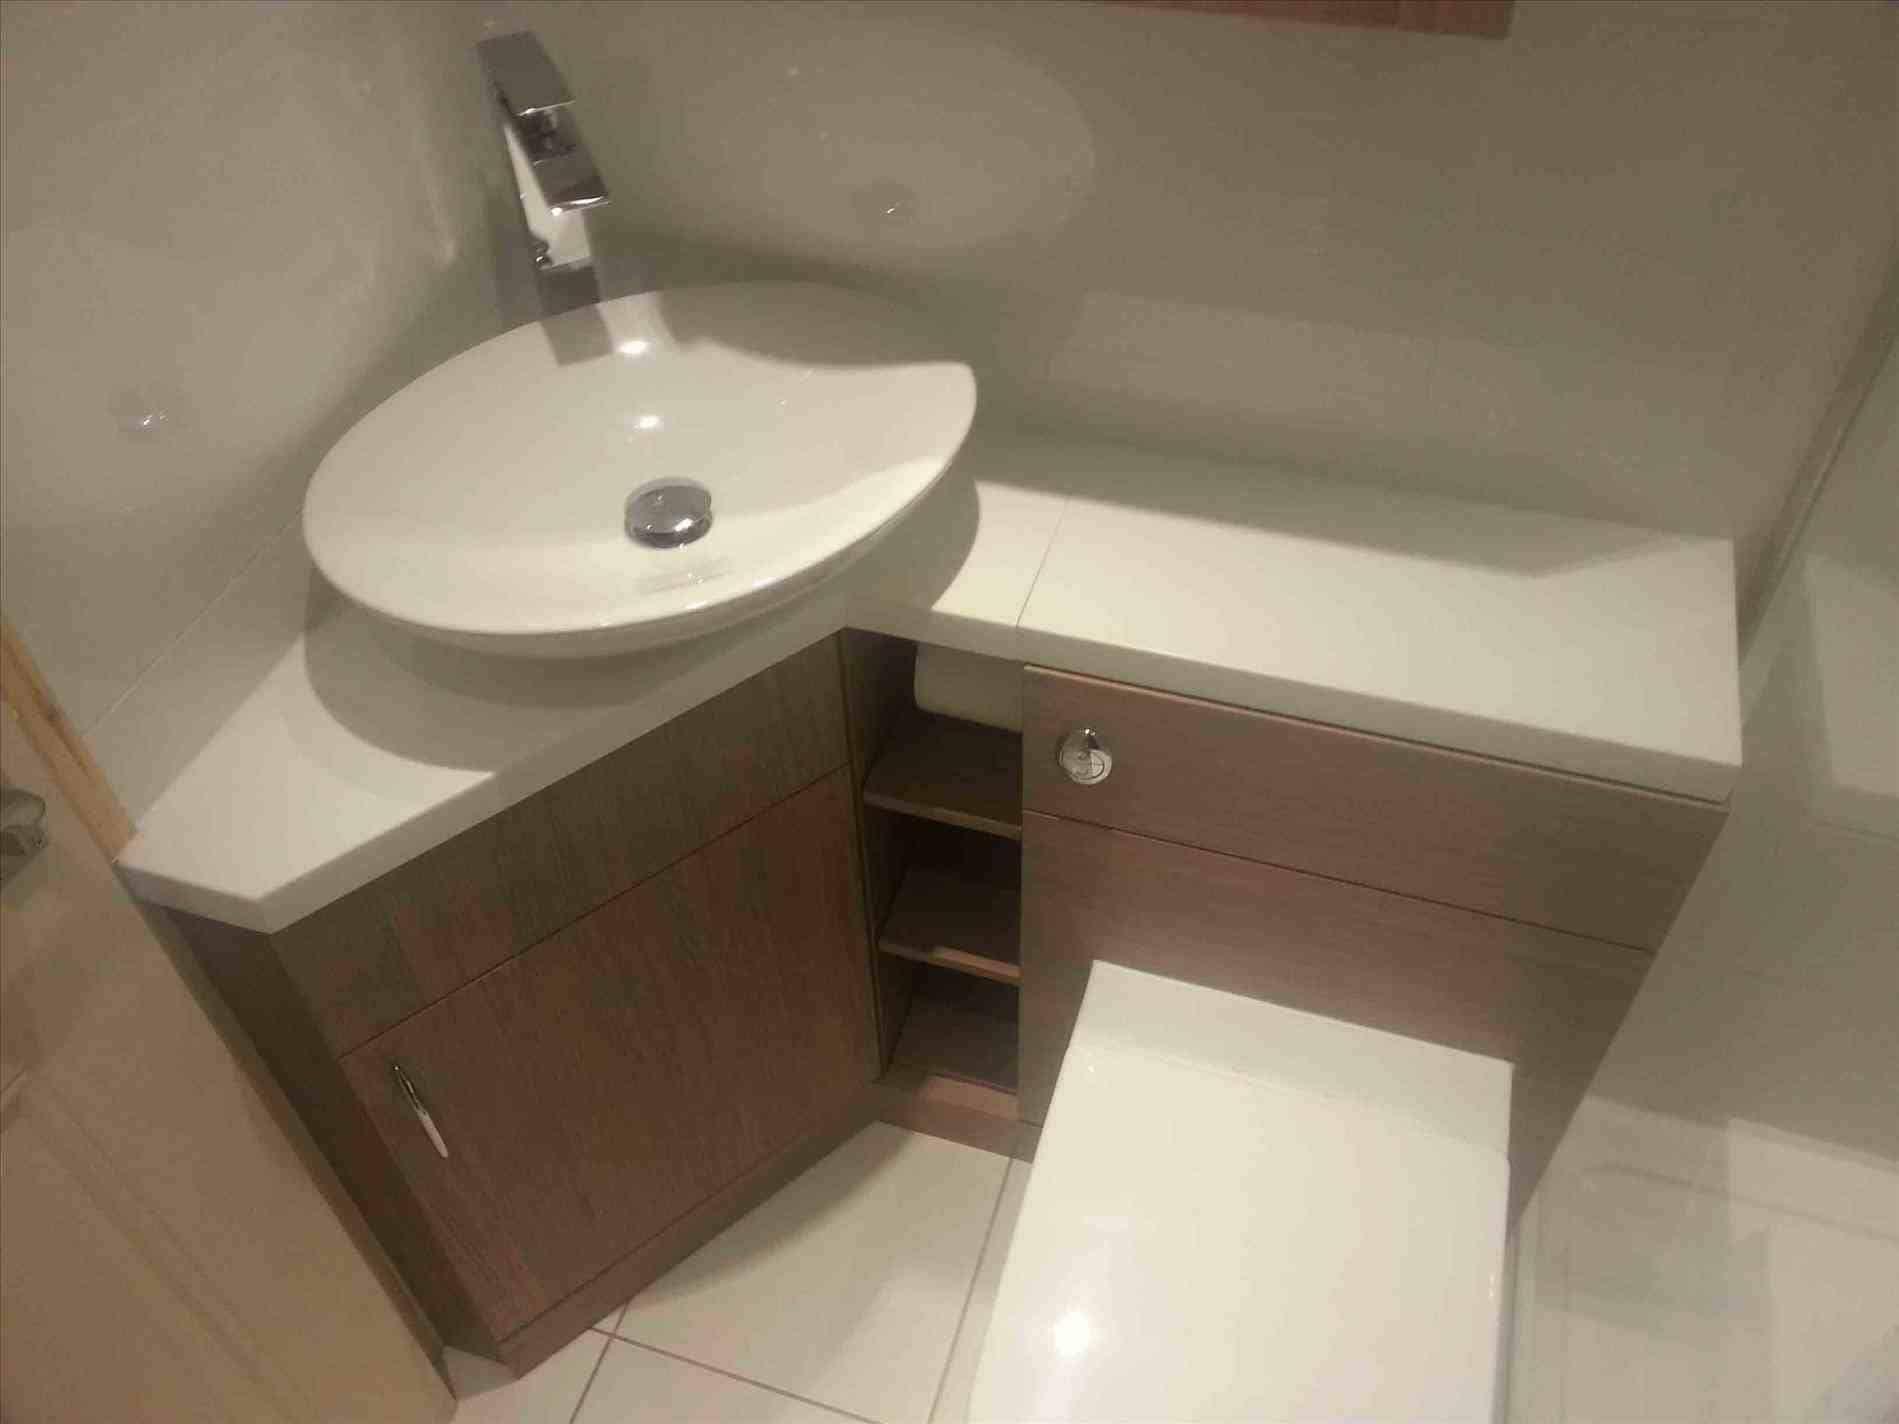 Lavabo Banheiro Embaixo Da Escada 132 Fotos E Ideias Tc Small Bathroom Vanities Corner Bathroom Vanity Small Bathroom Sinks